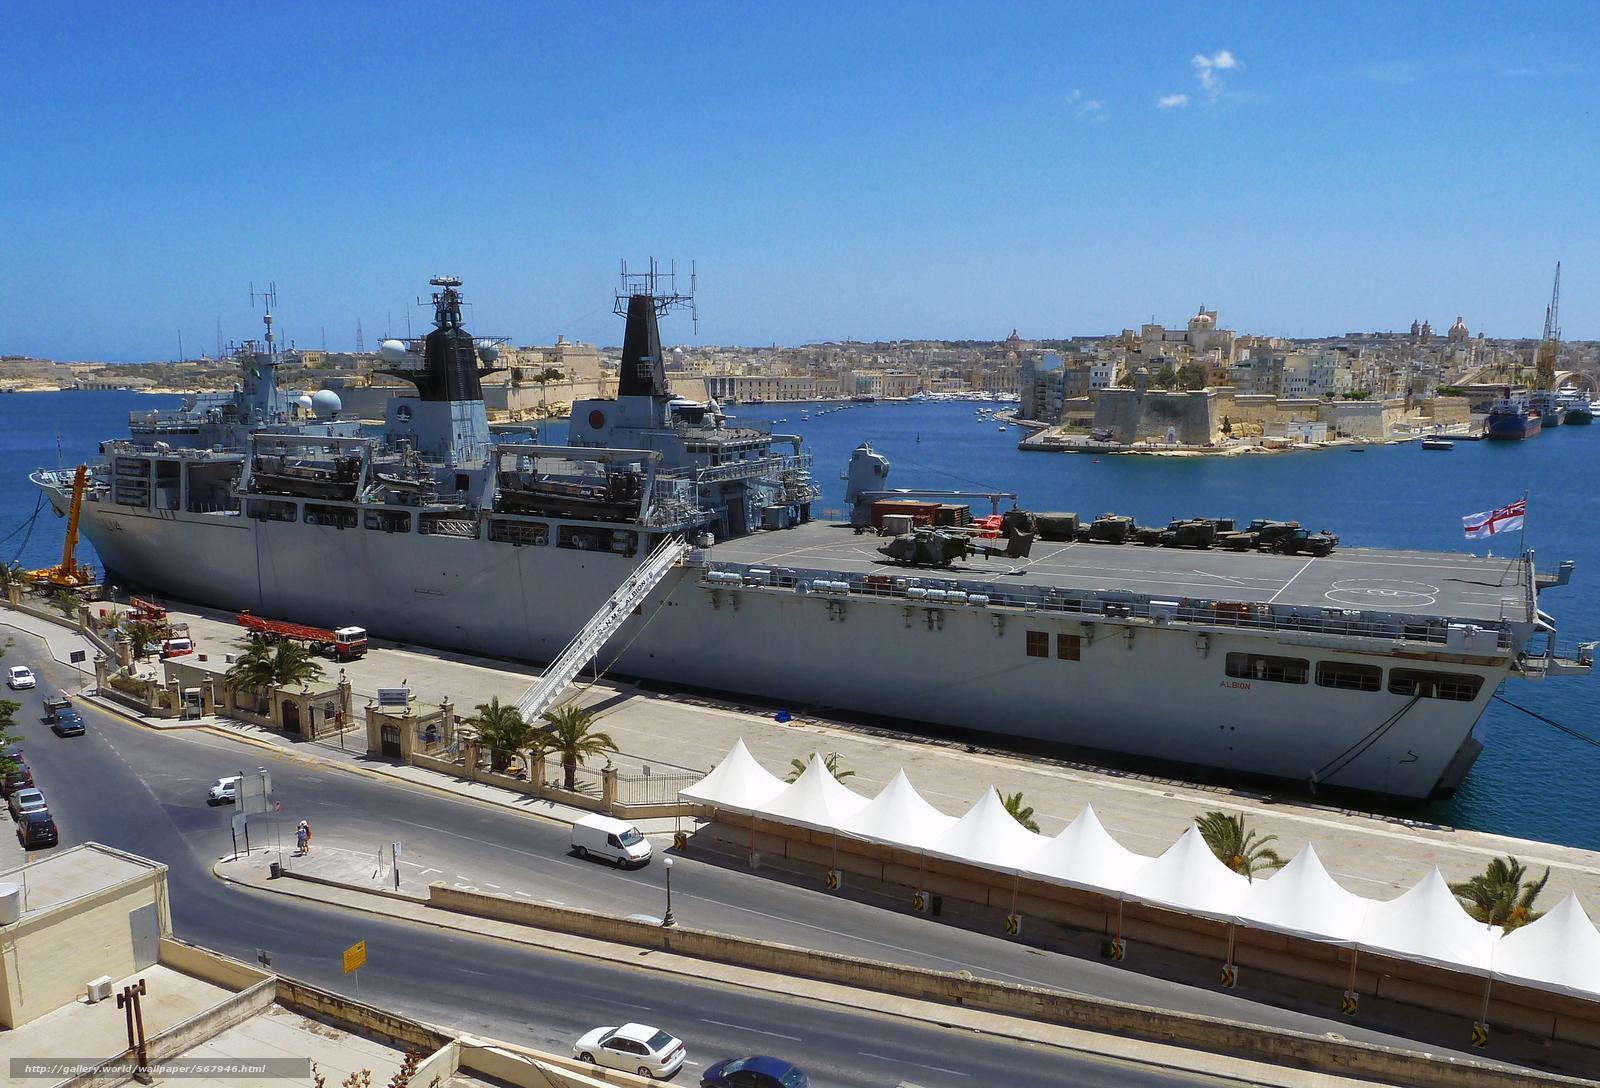 Download wallpaper Royal Naval landing platform Dock (LPD) ship,  HMS Albion,  Malta free desktop wallpaper in the resolution 2500x1700 — picture №567946